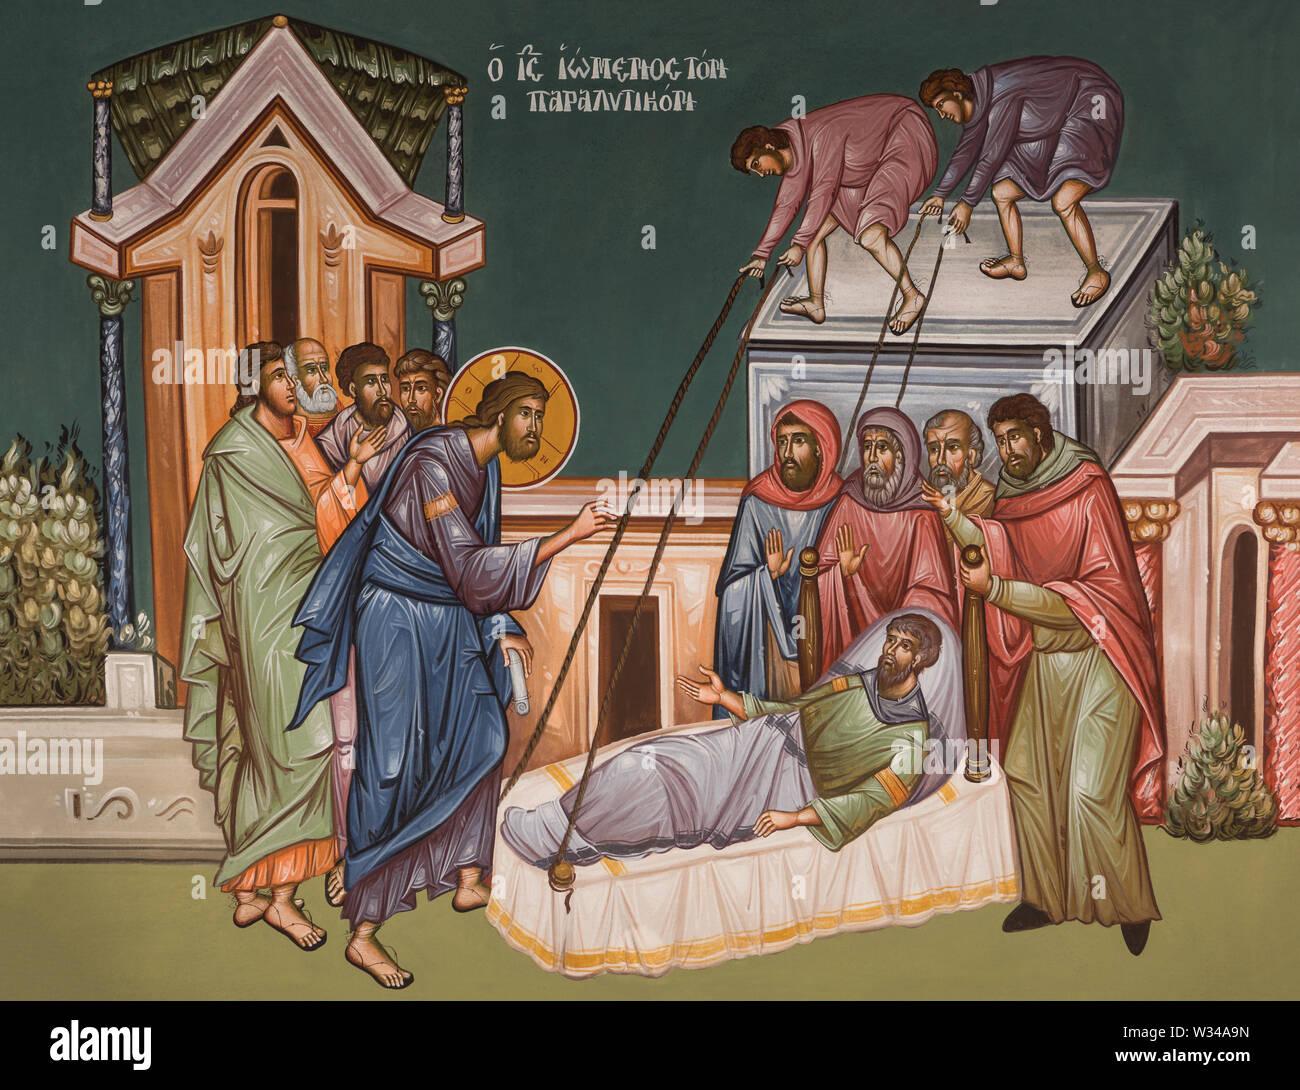 Ortthodox icon of Jesus healing paralyzed man Stock Photo